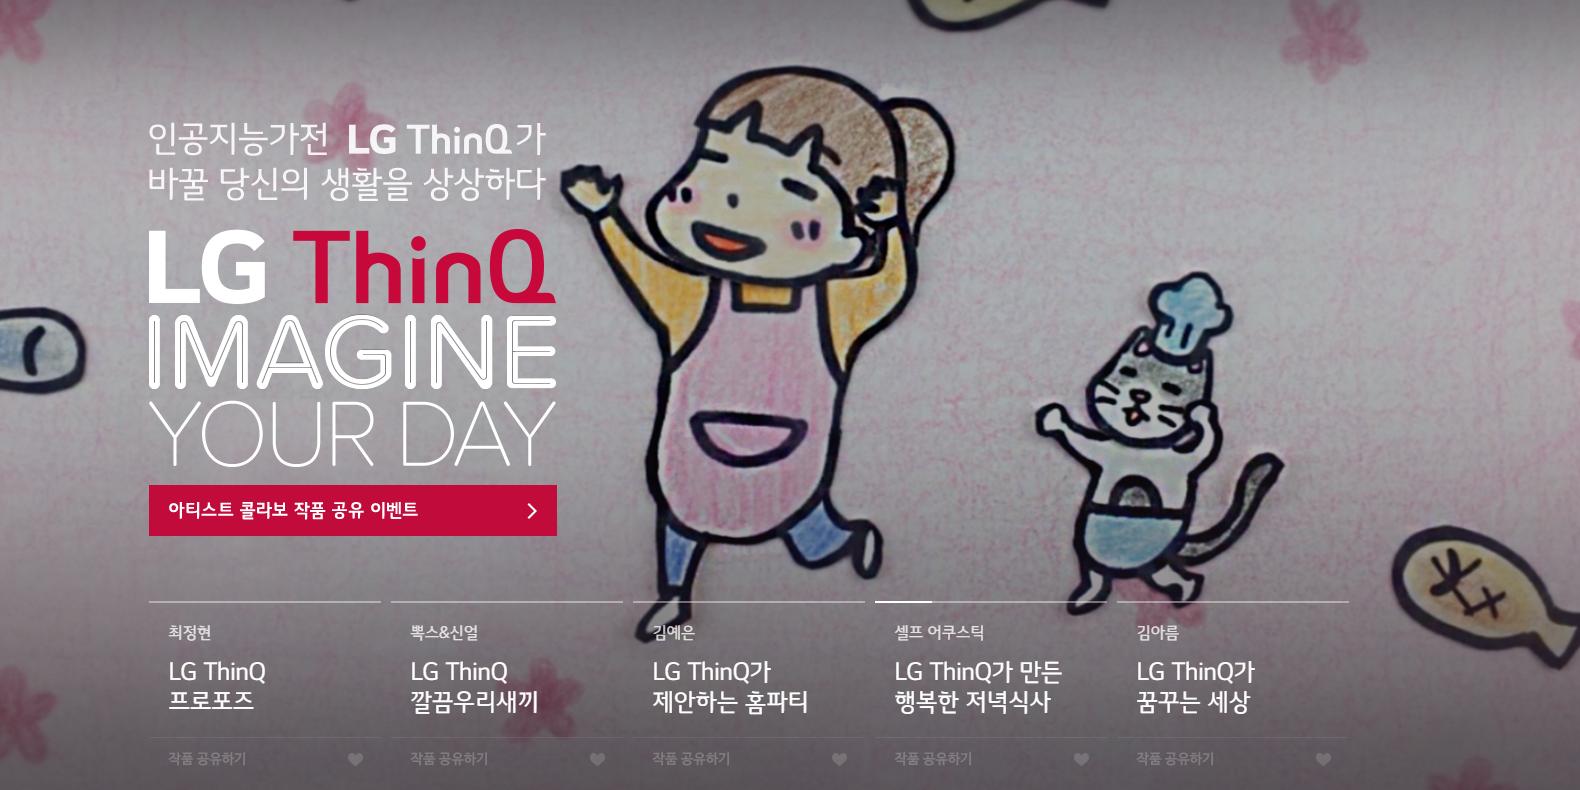 LG ThinQ 아티스트 콜라보 작품 공유 이벤트